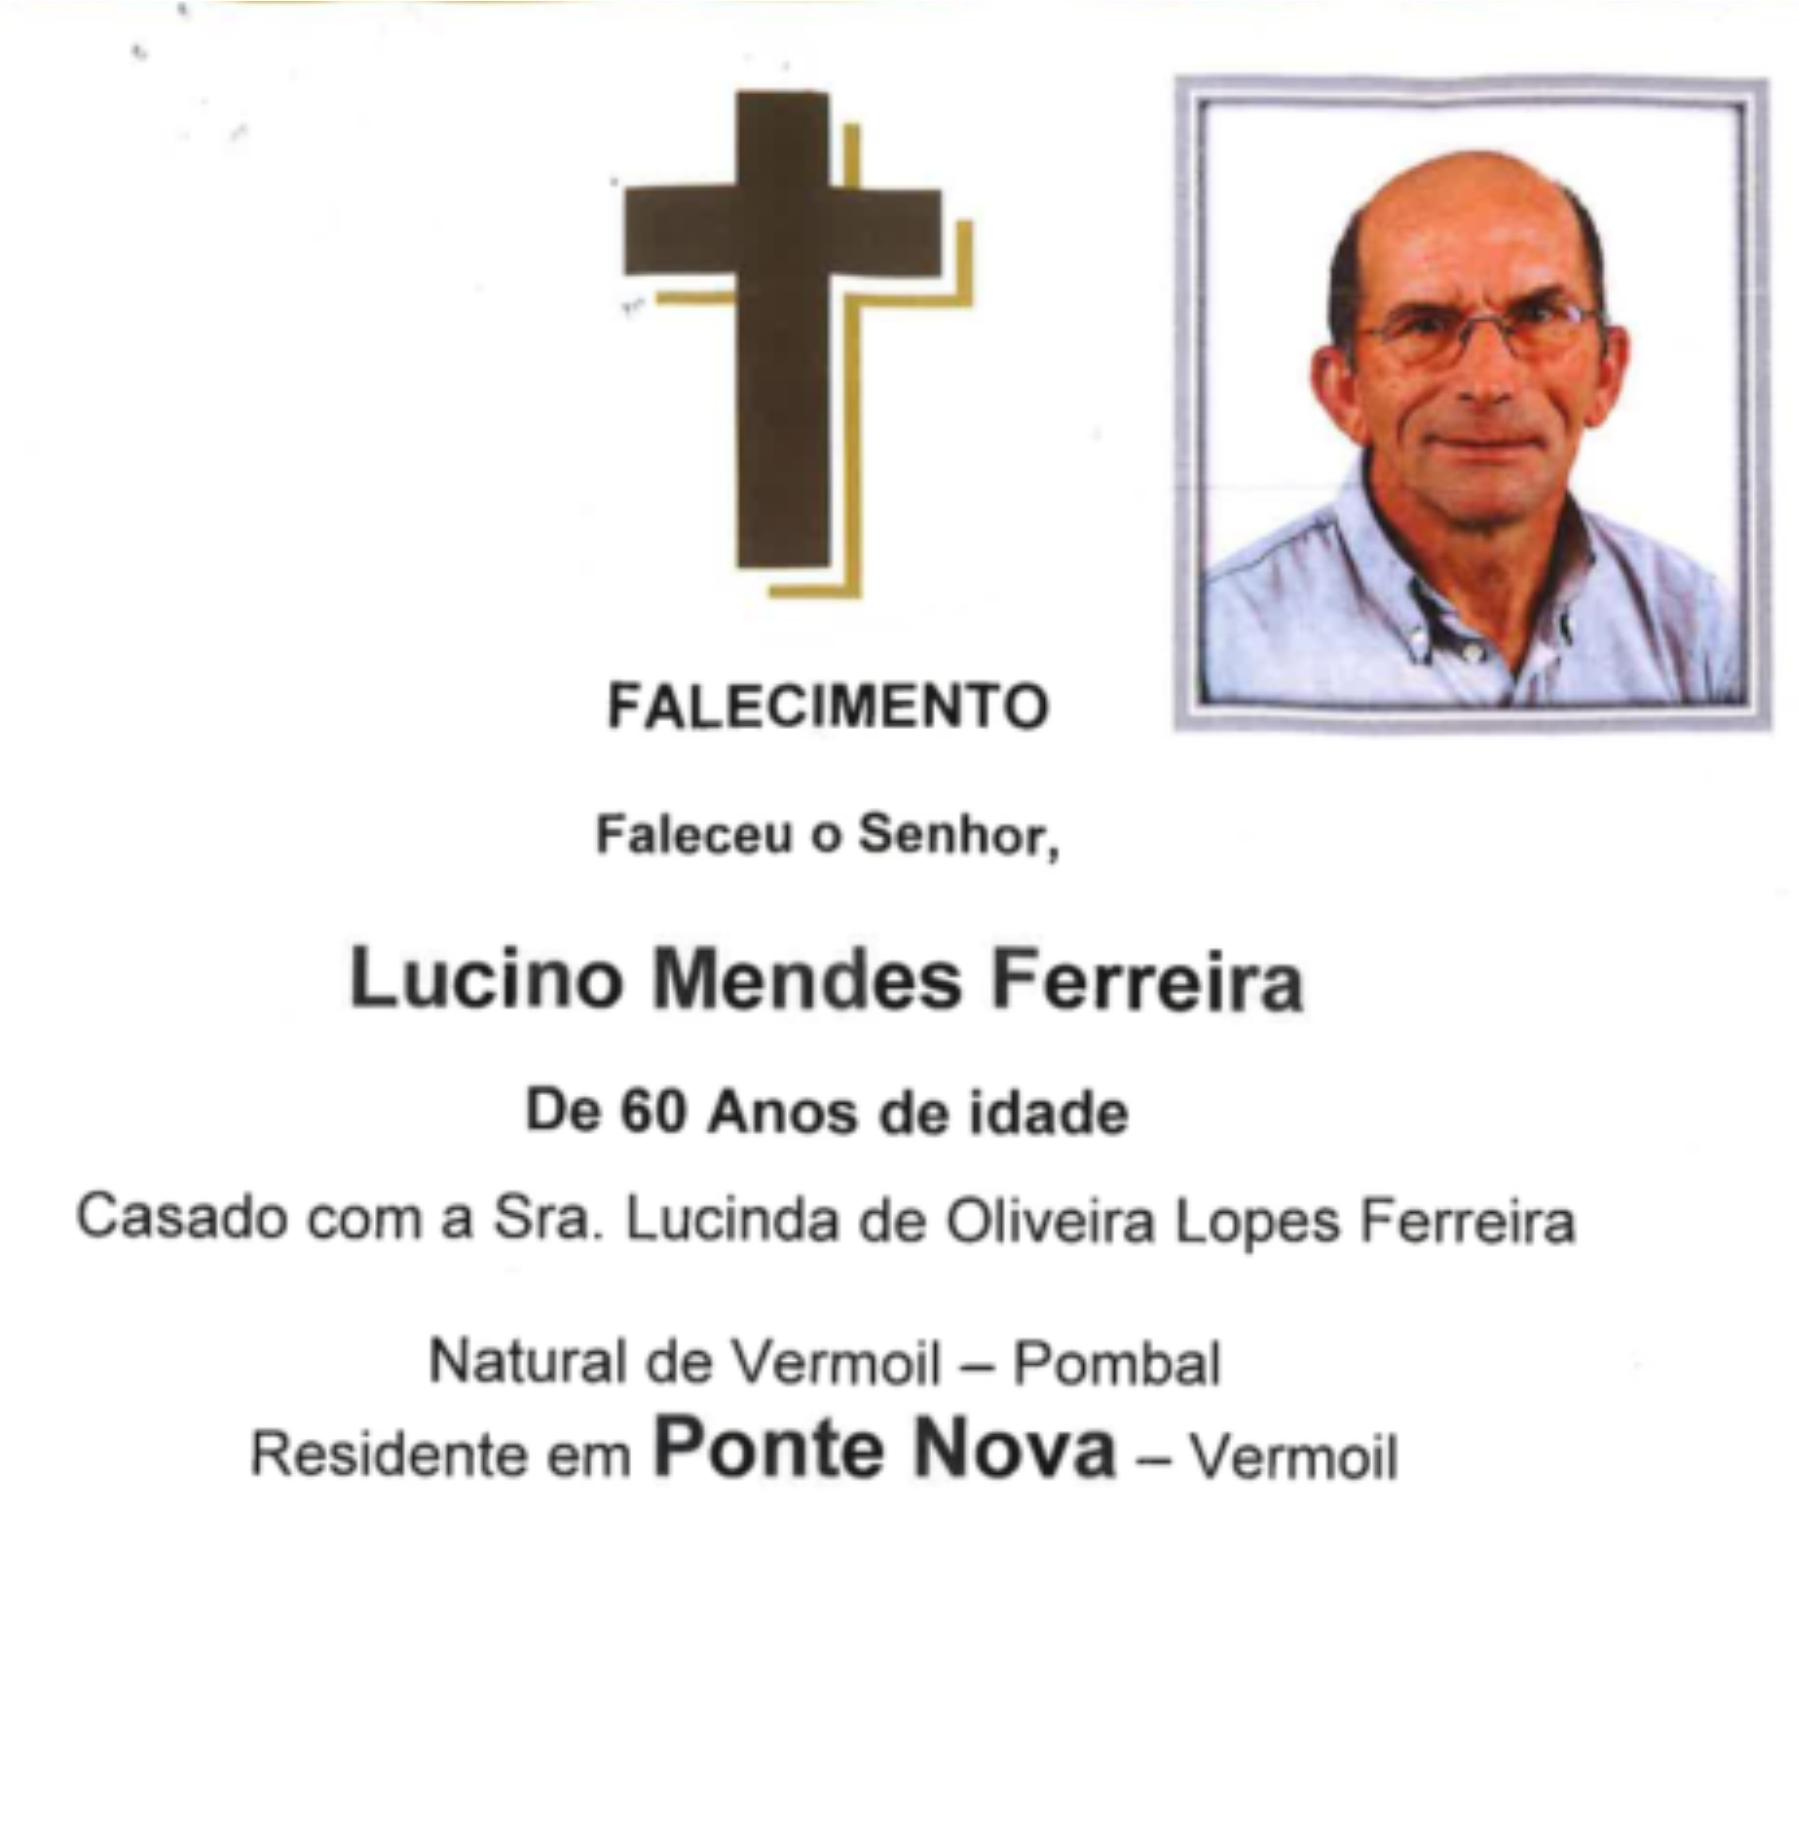 16-04-20 - Lucino Mendes Ferreira - Ponte Nova